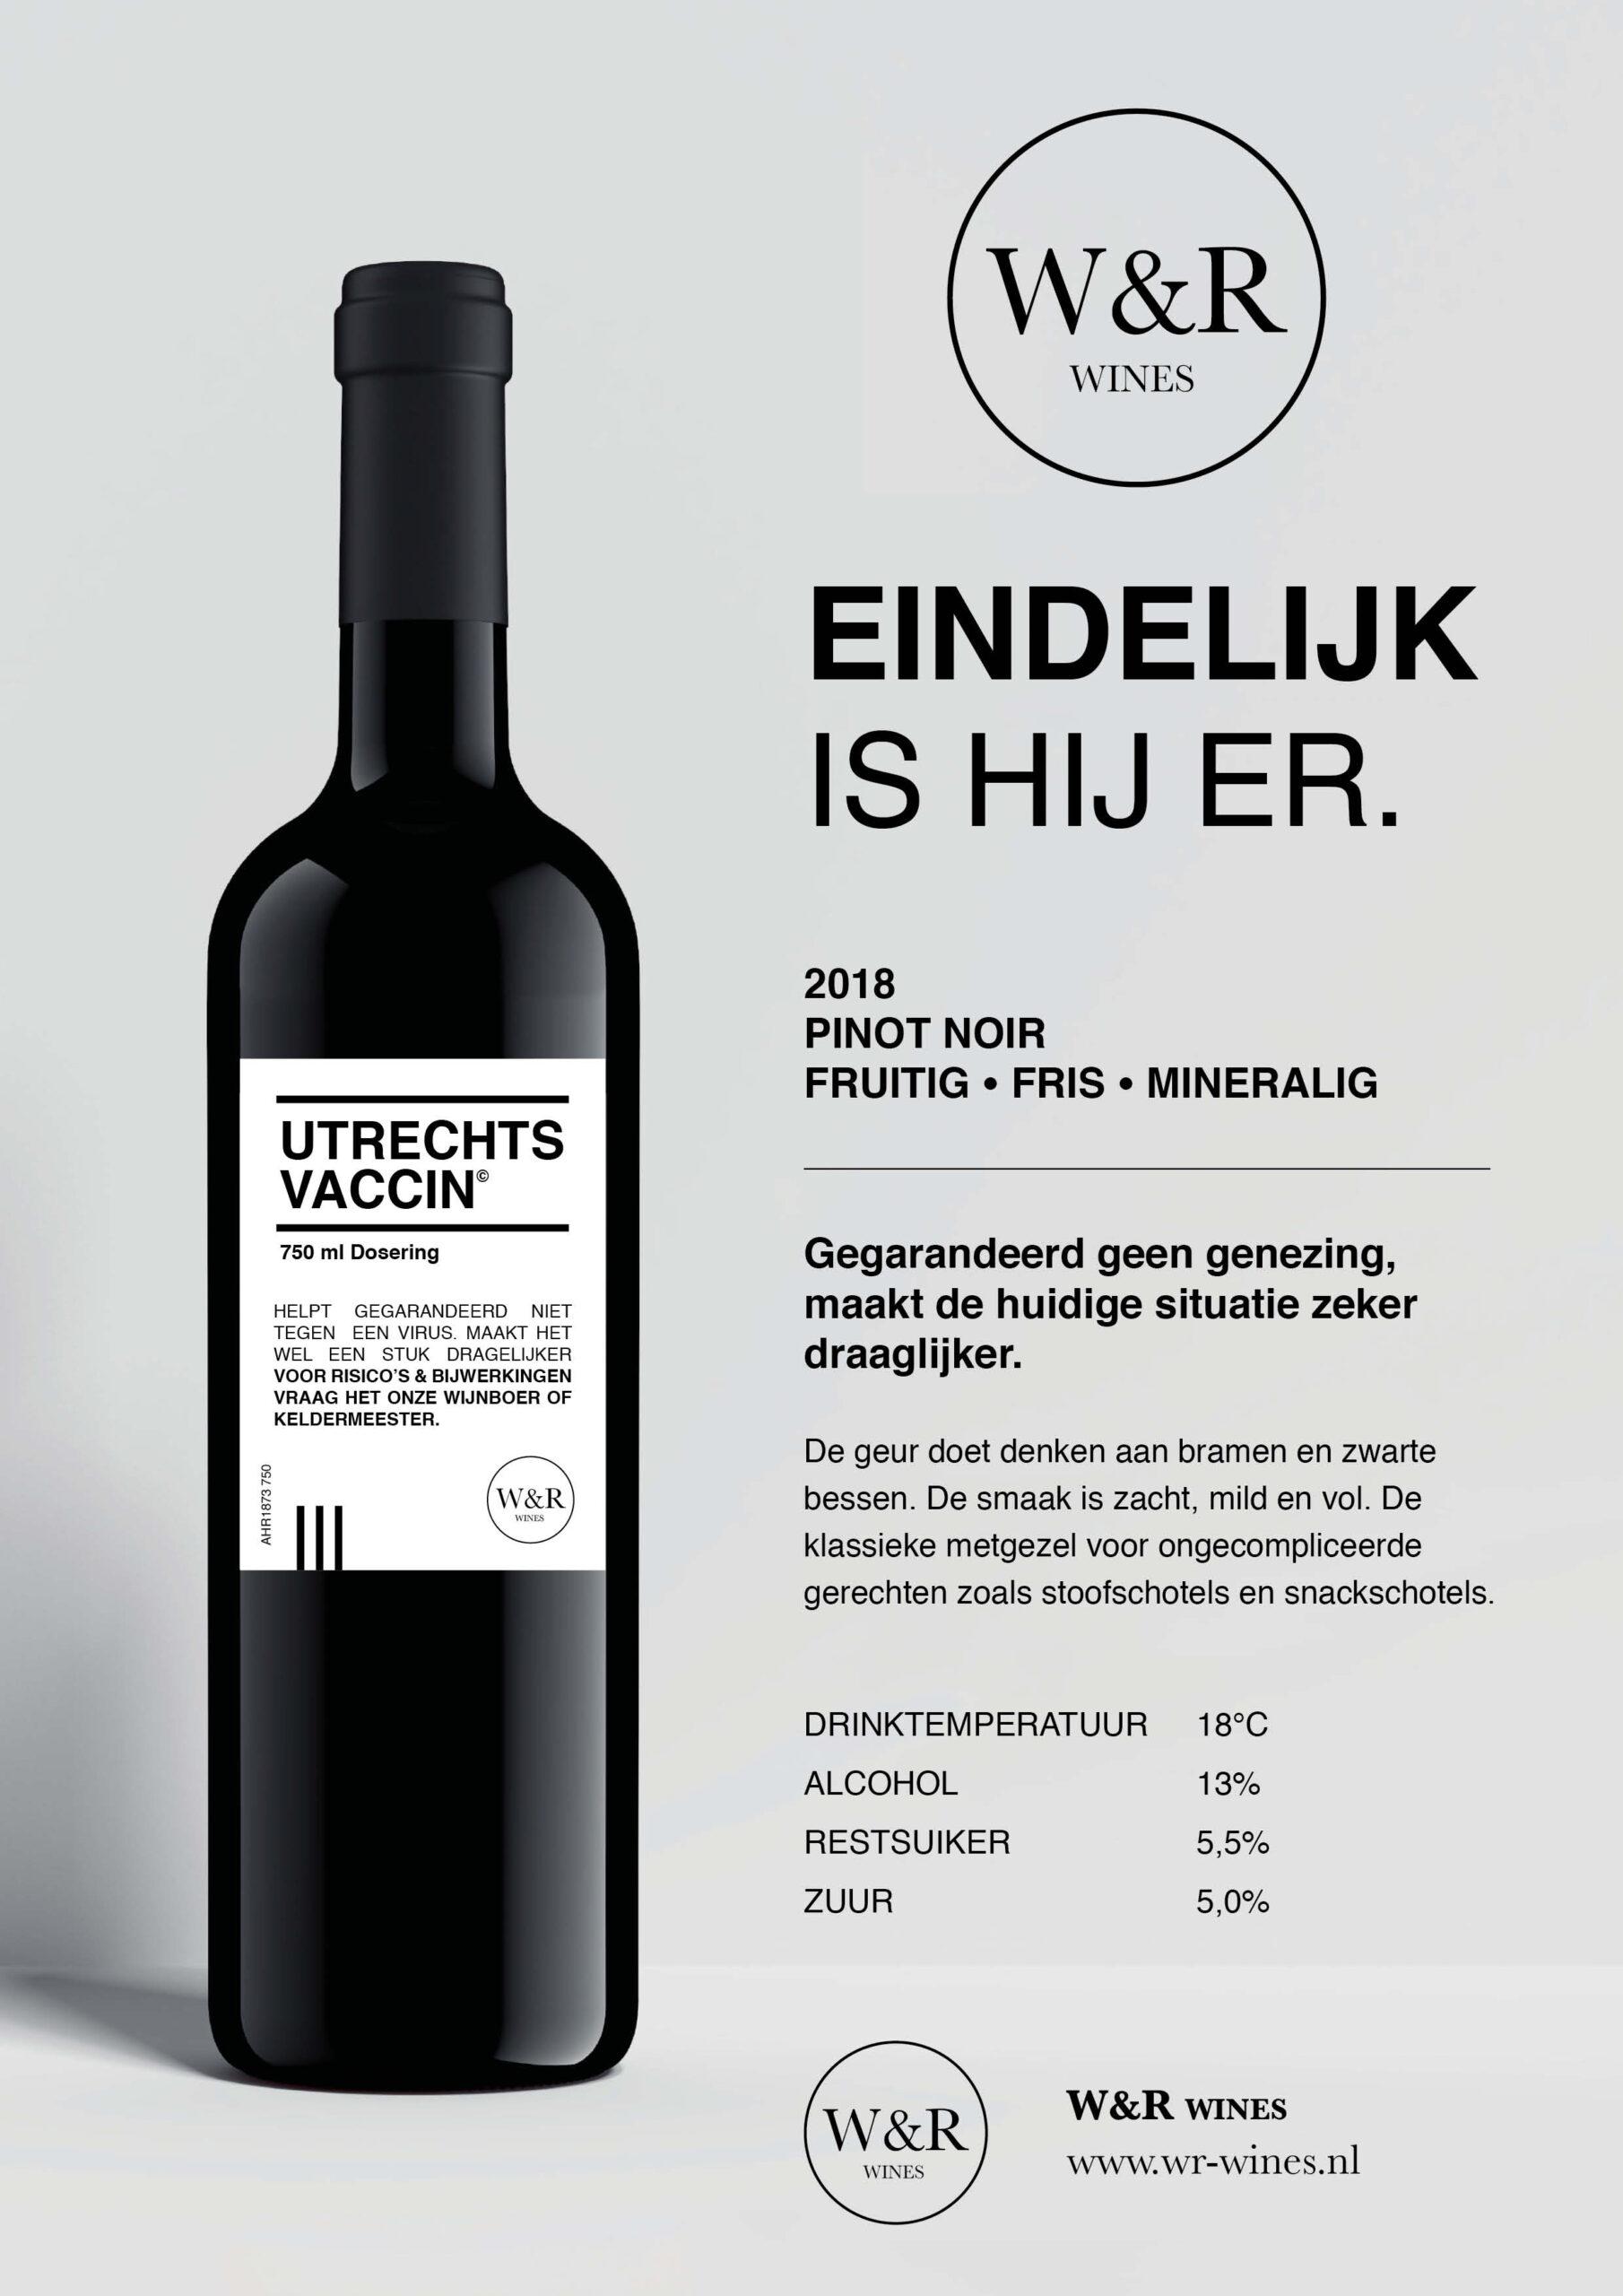 Utrechts vaccin